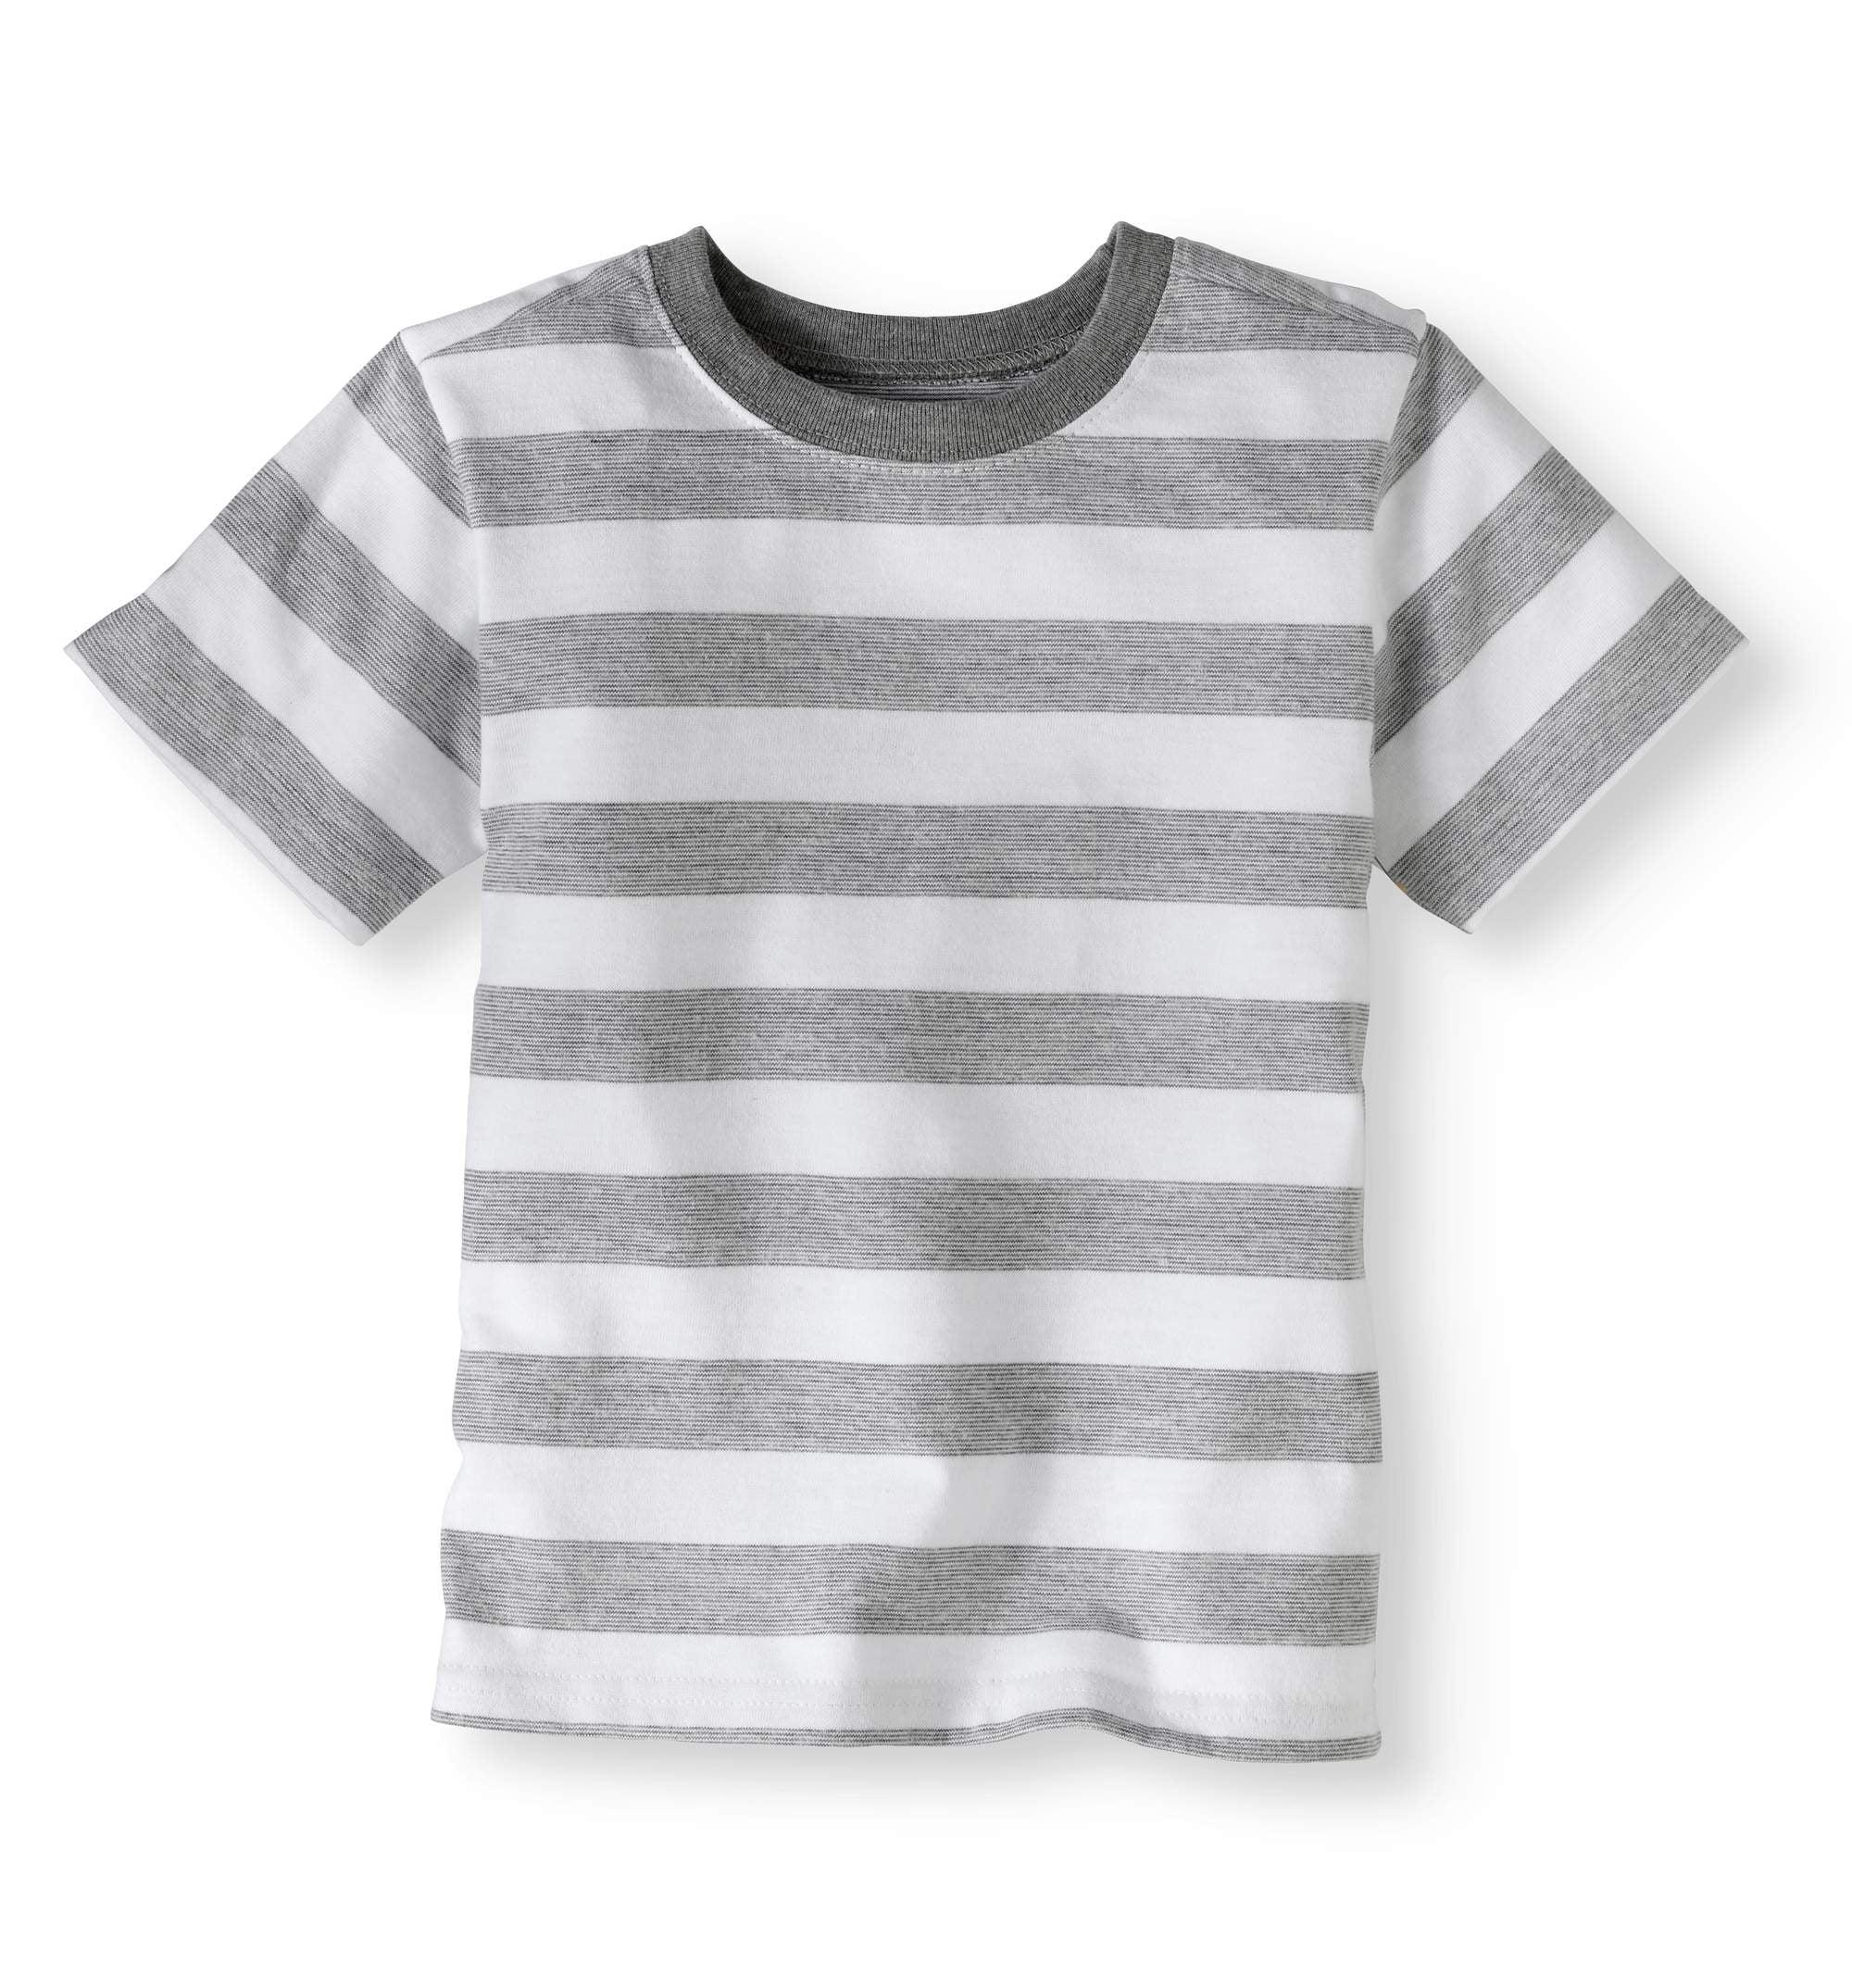 Clothing Tees Boys Grey Striped T-shirt